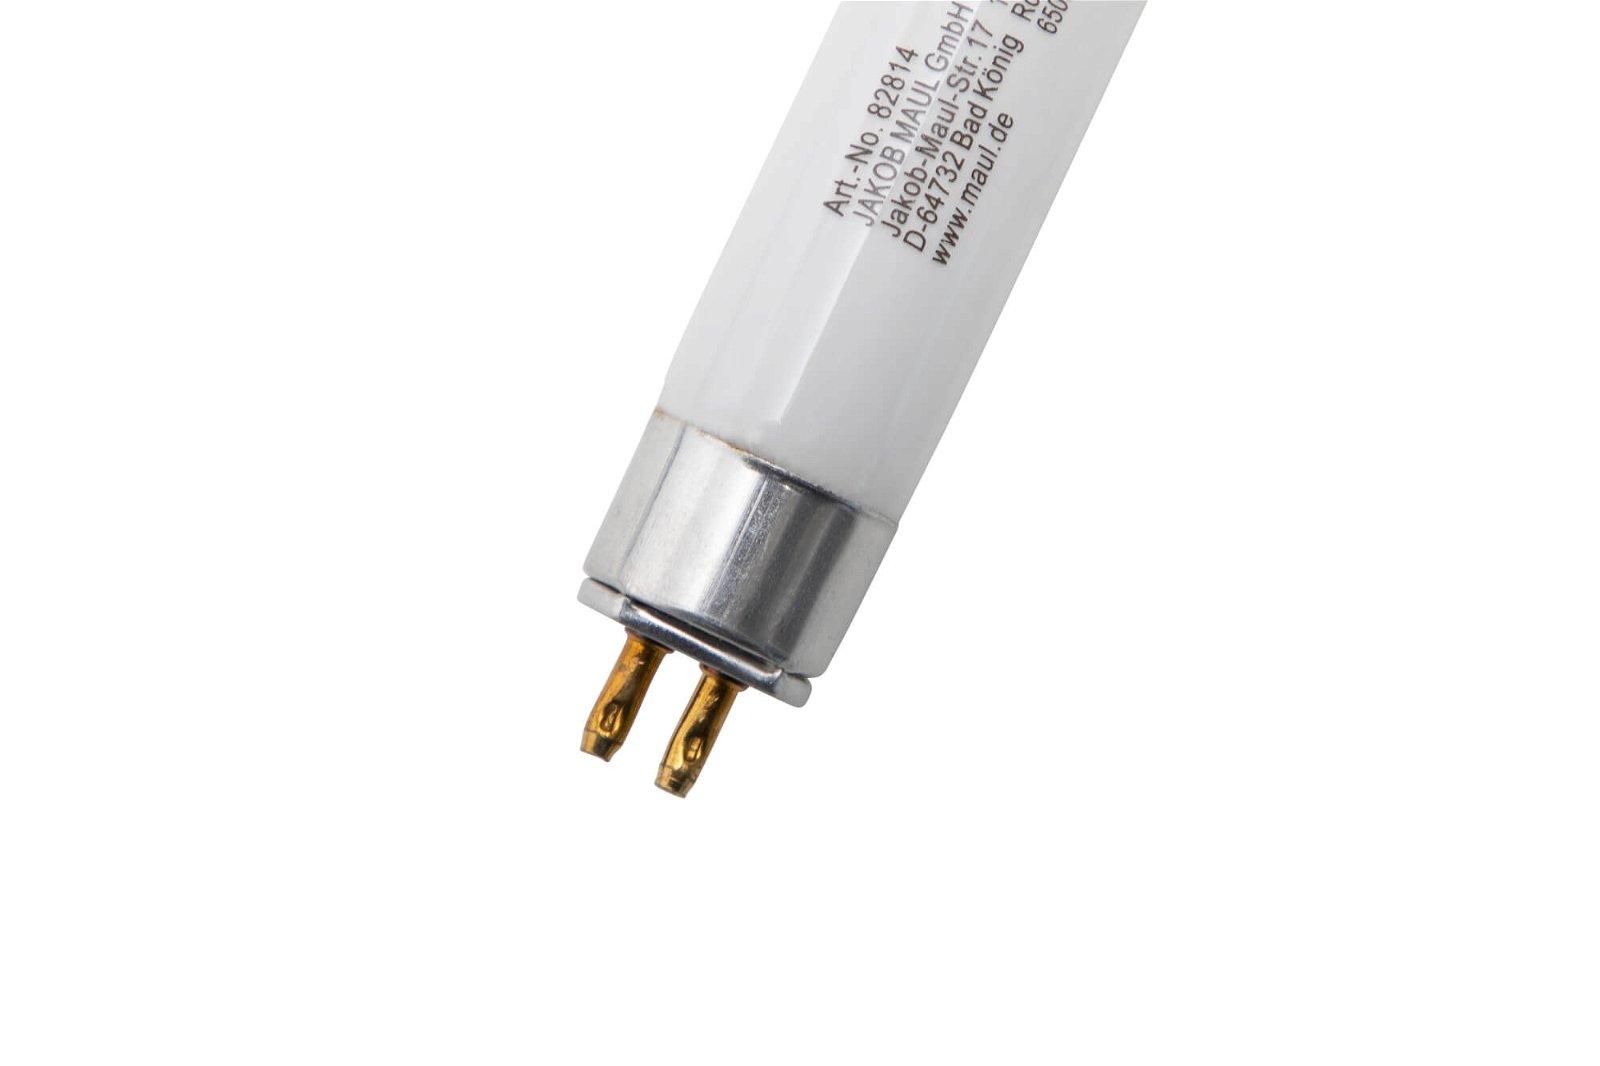 Energiespar-Leuchtmittel, Sockel G5, 6500 K, glasklar